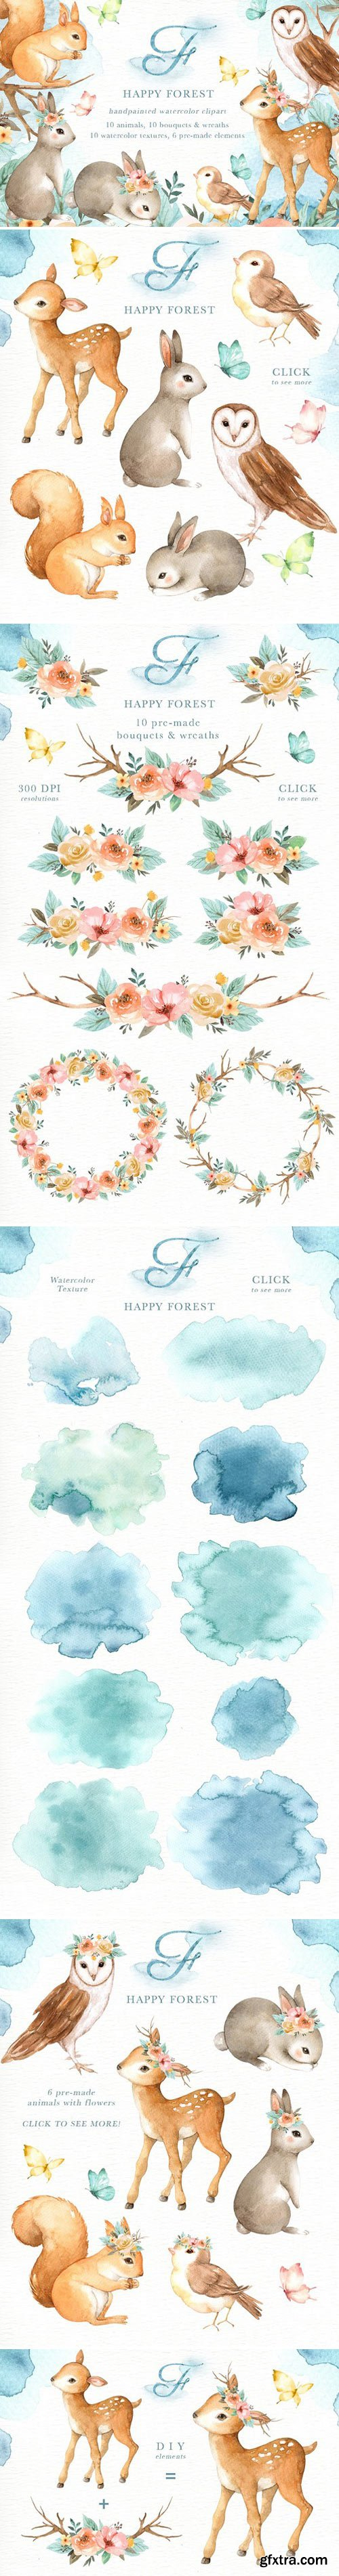 CM - Happy Forest Watercolor Clip Art 2356893